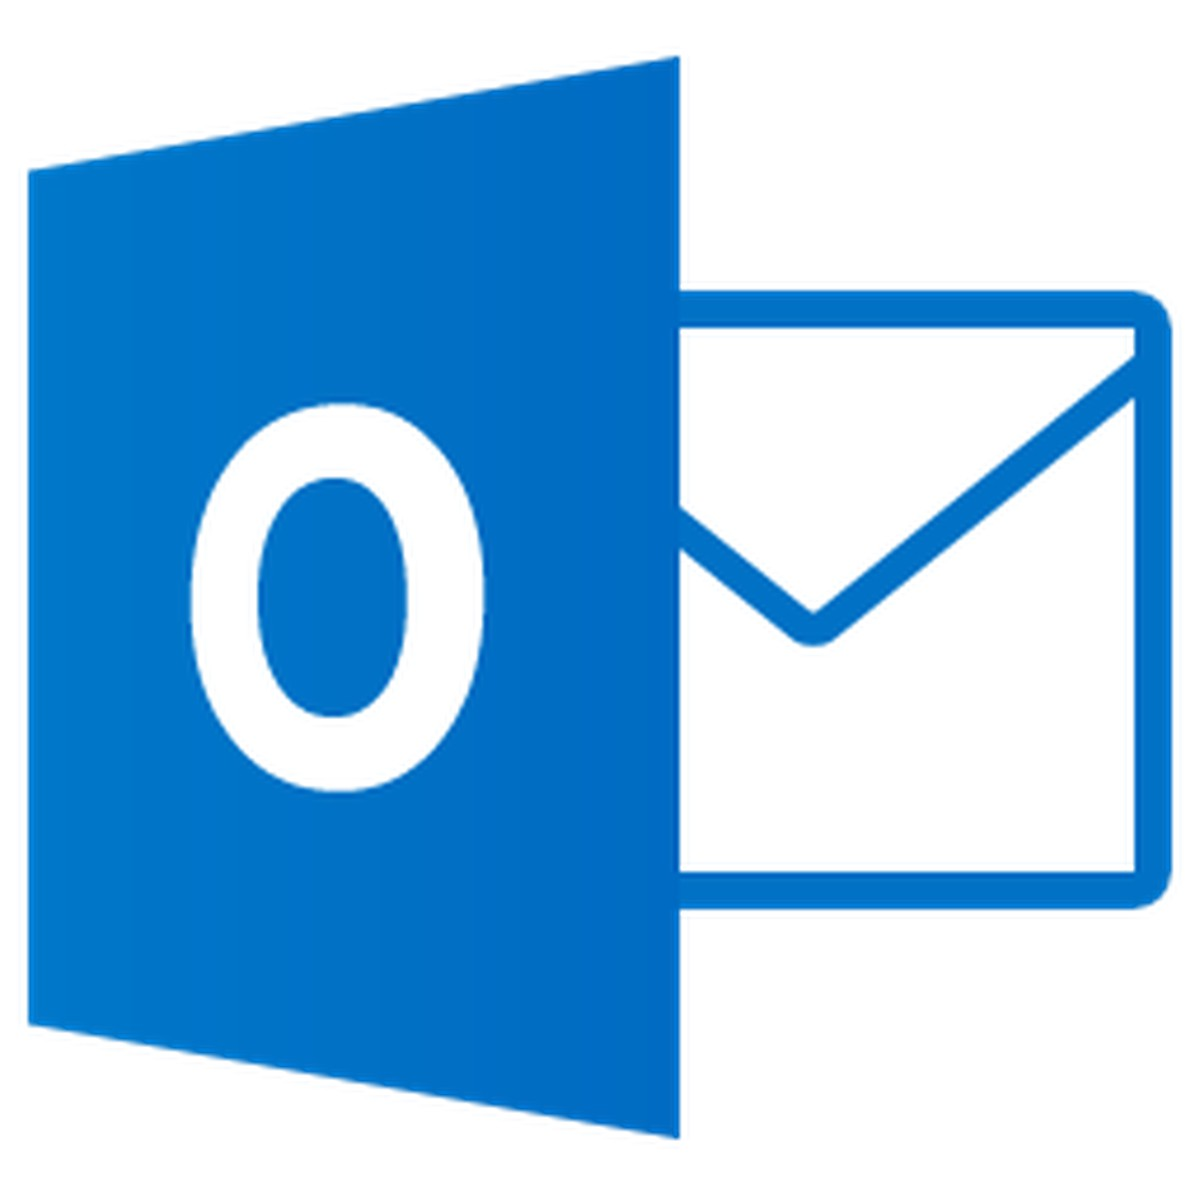 Outlook Briefpapier Fur Emails So Geht S Chip